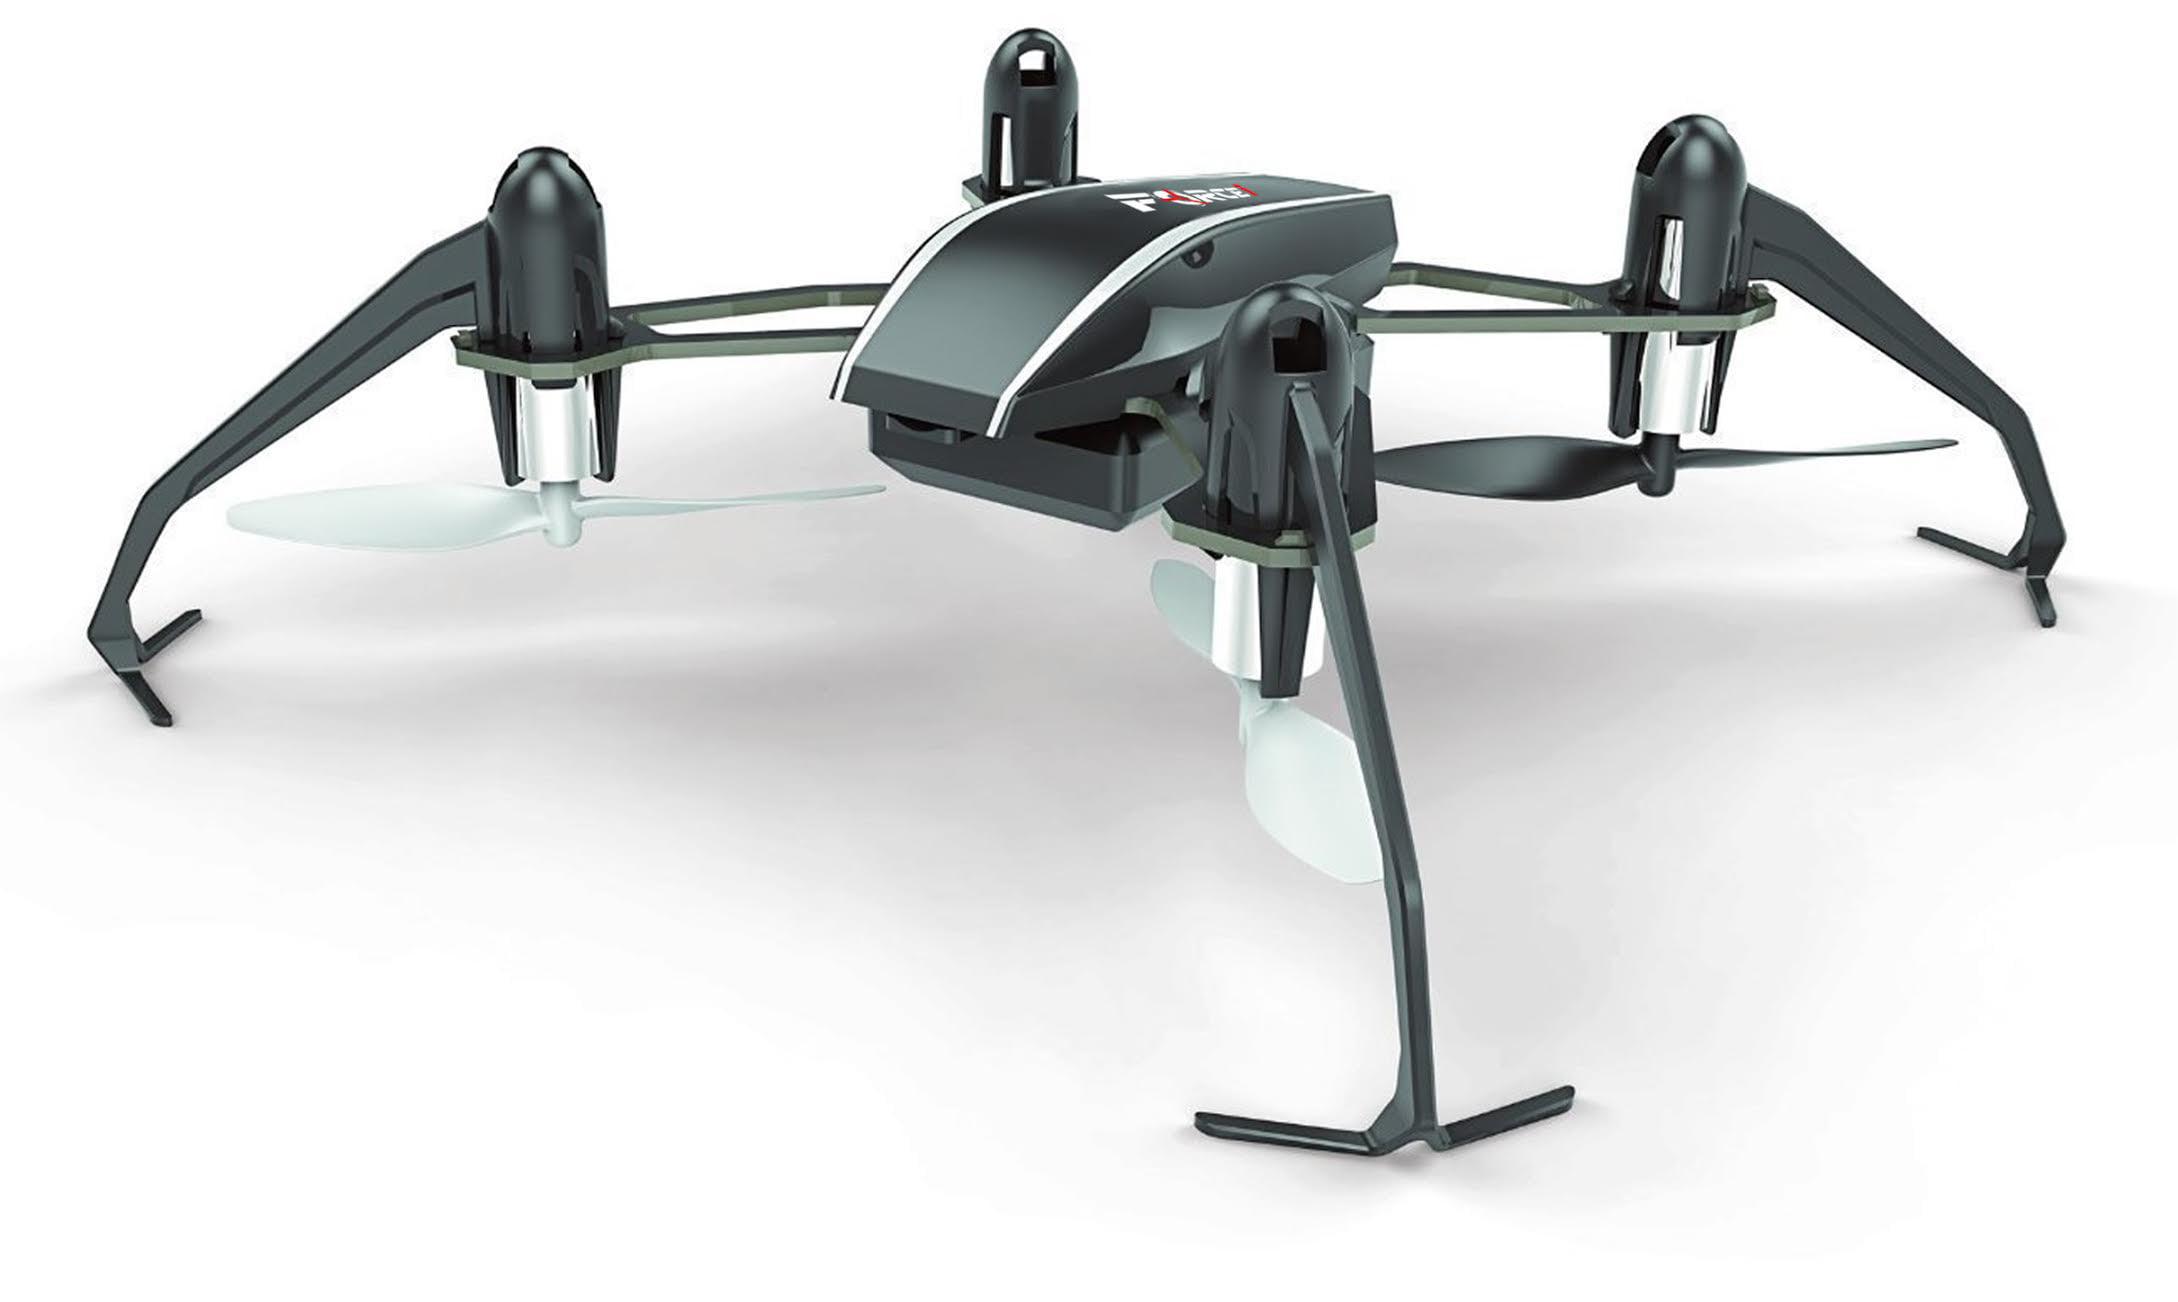 UDI Freedom U32 RC Mini Quadcopter Drone RTF, Inverted Flight Stunt Master, Headless Mode,... by UDI RC